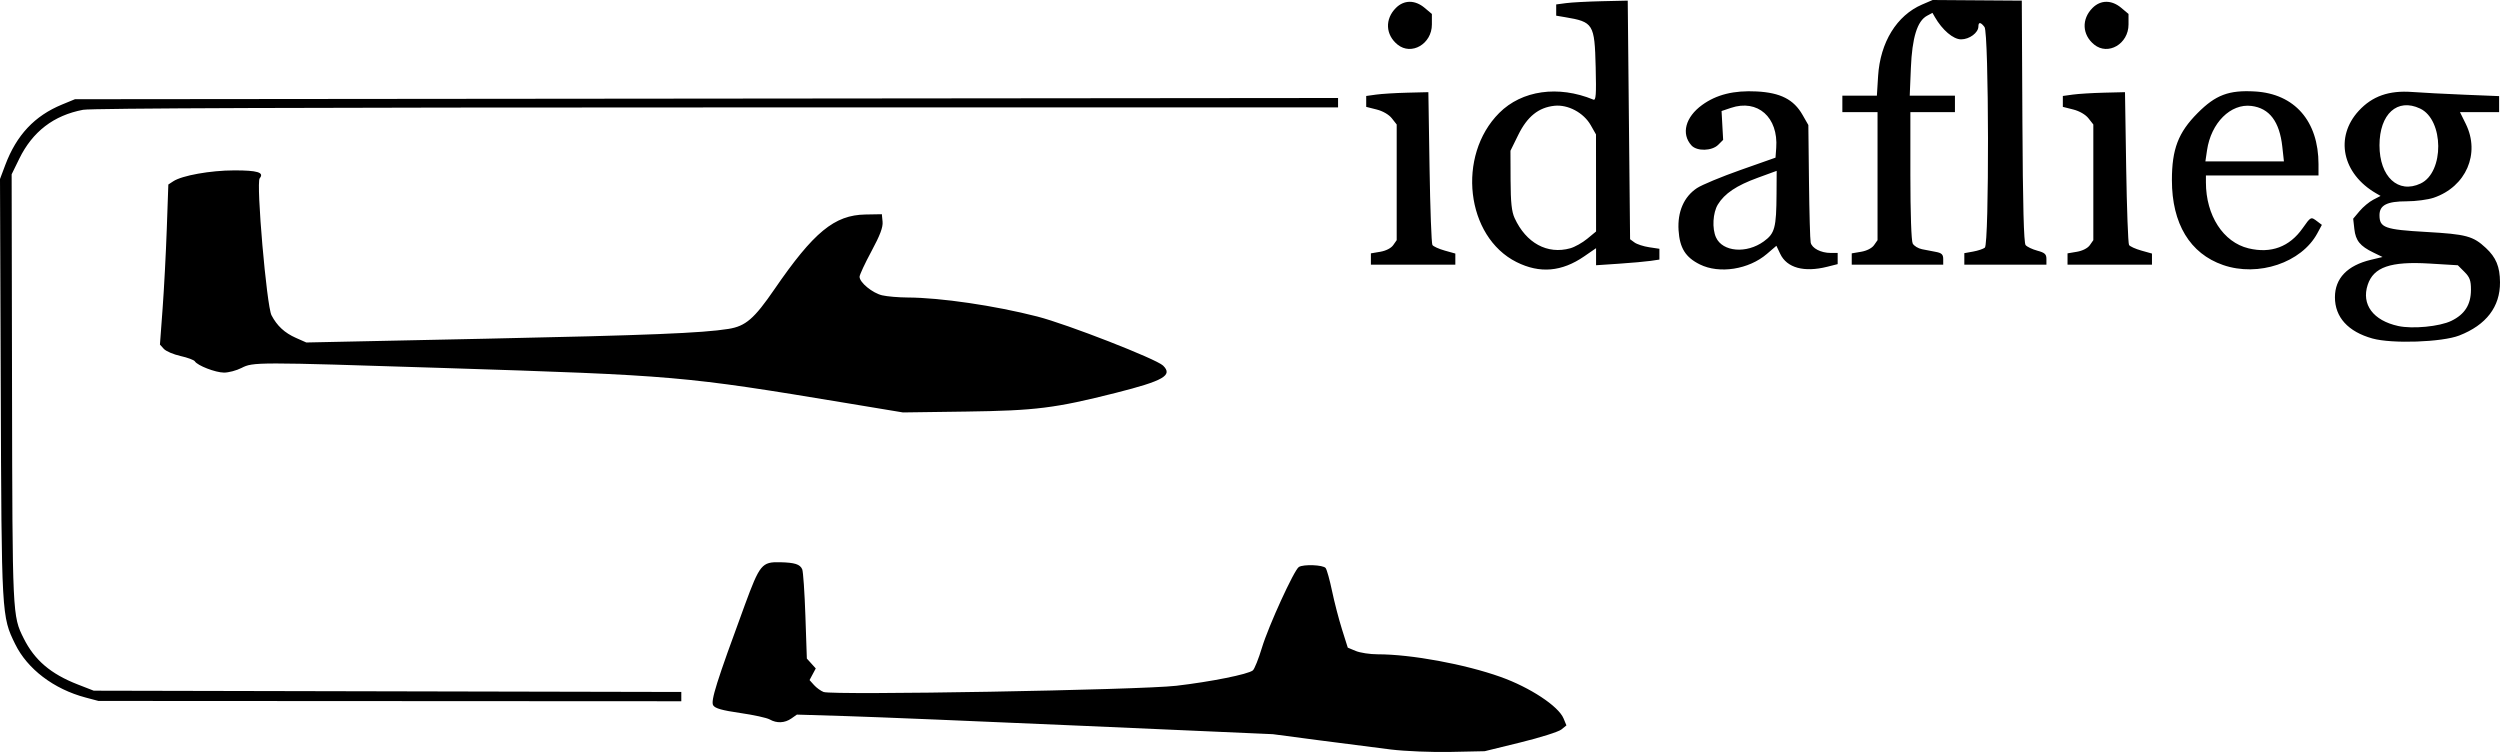 Idaflieg Logo